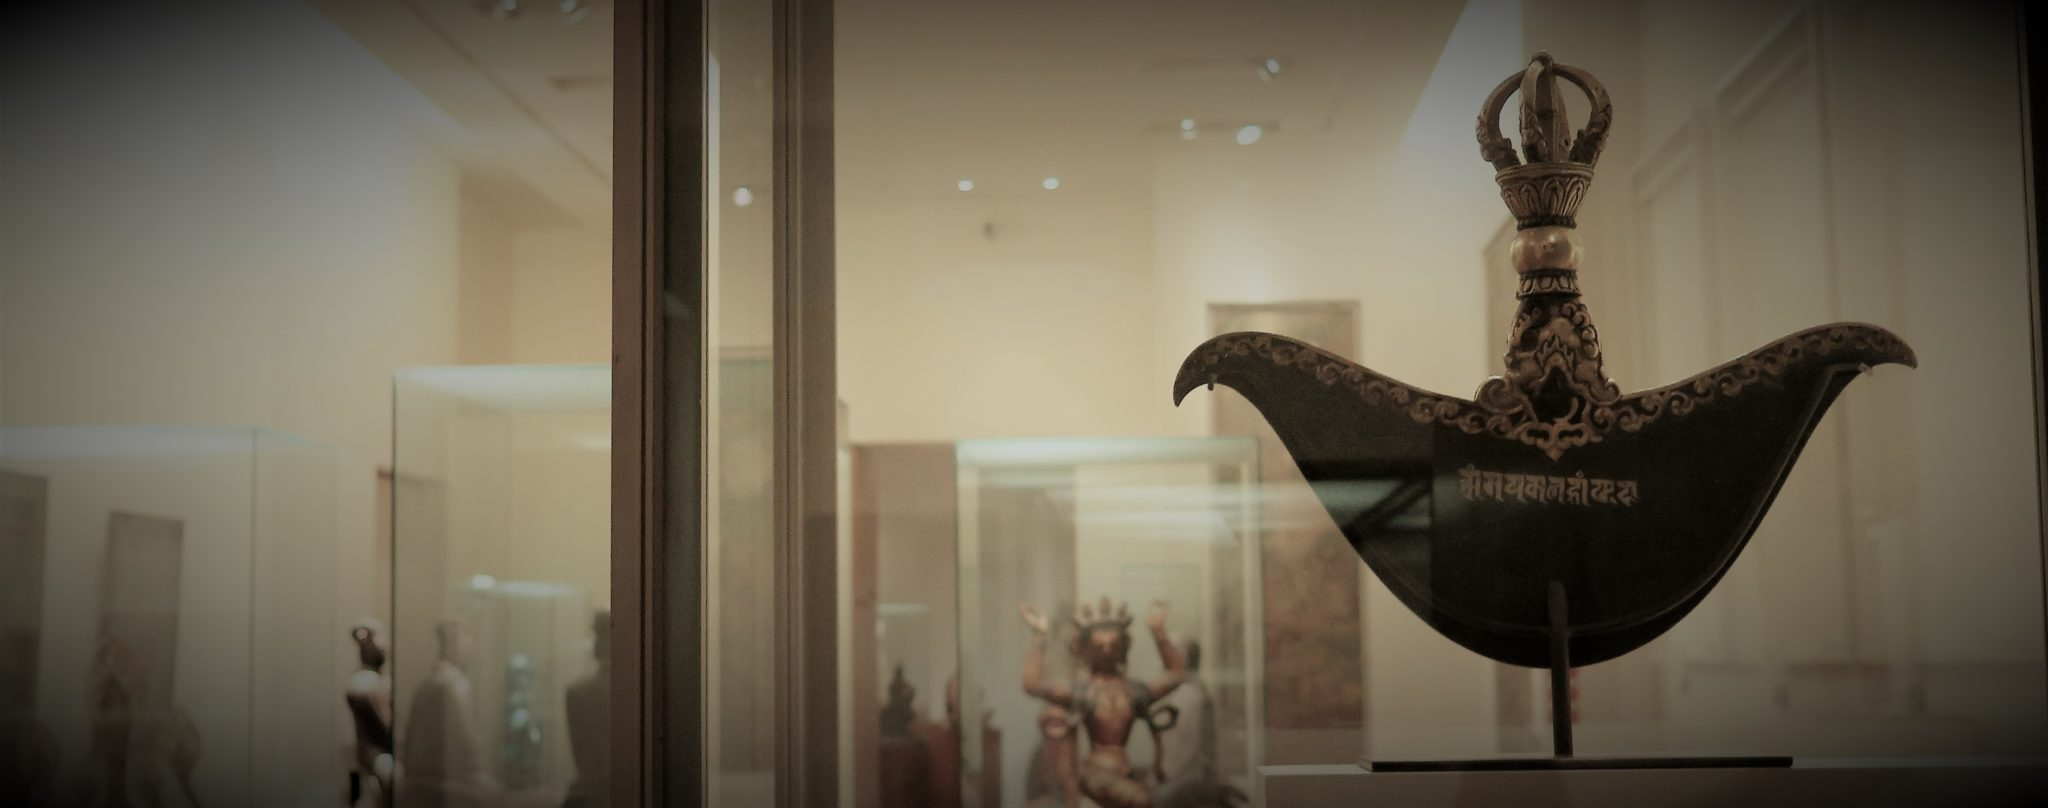 kartika musée Guimet siginification